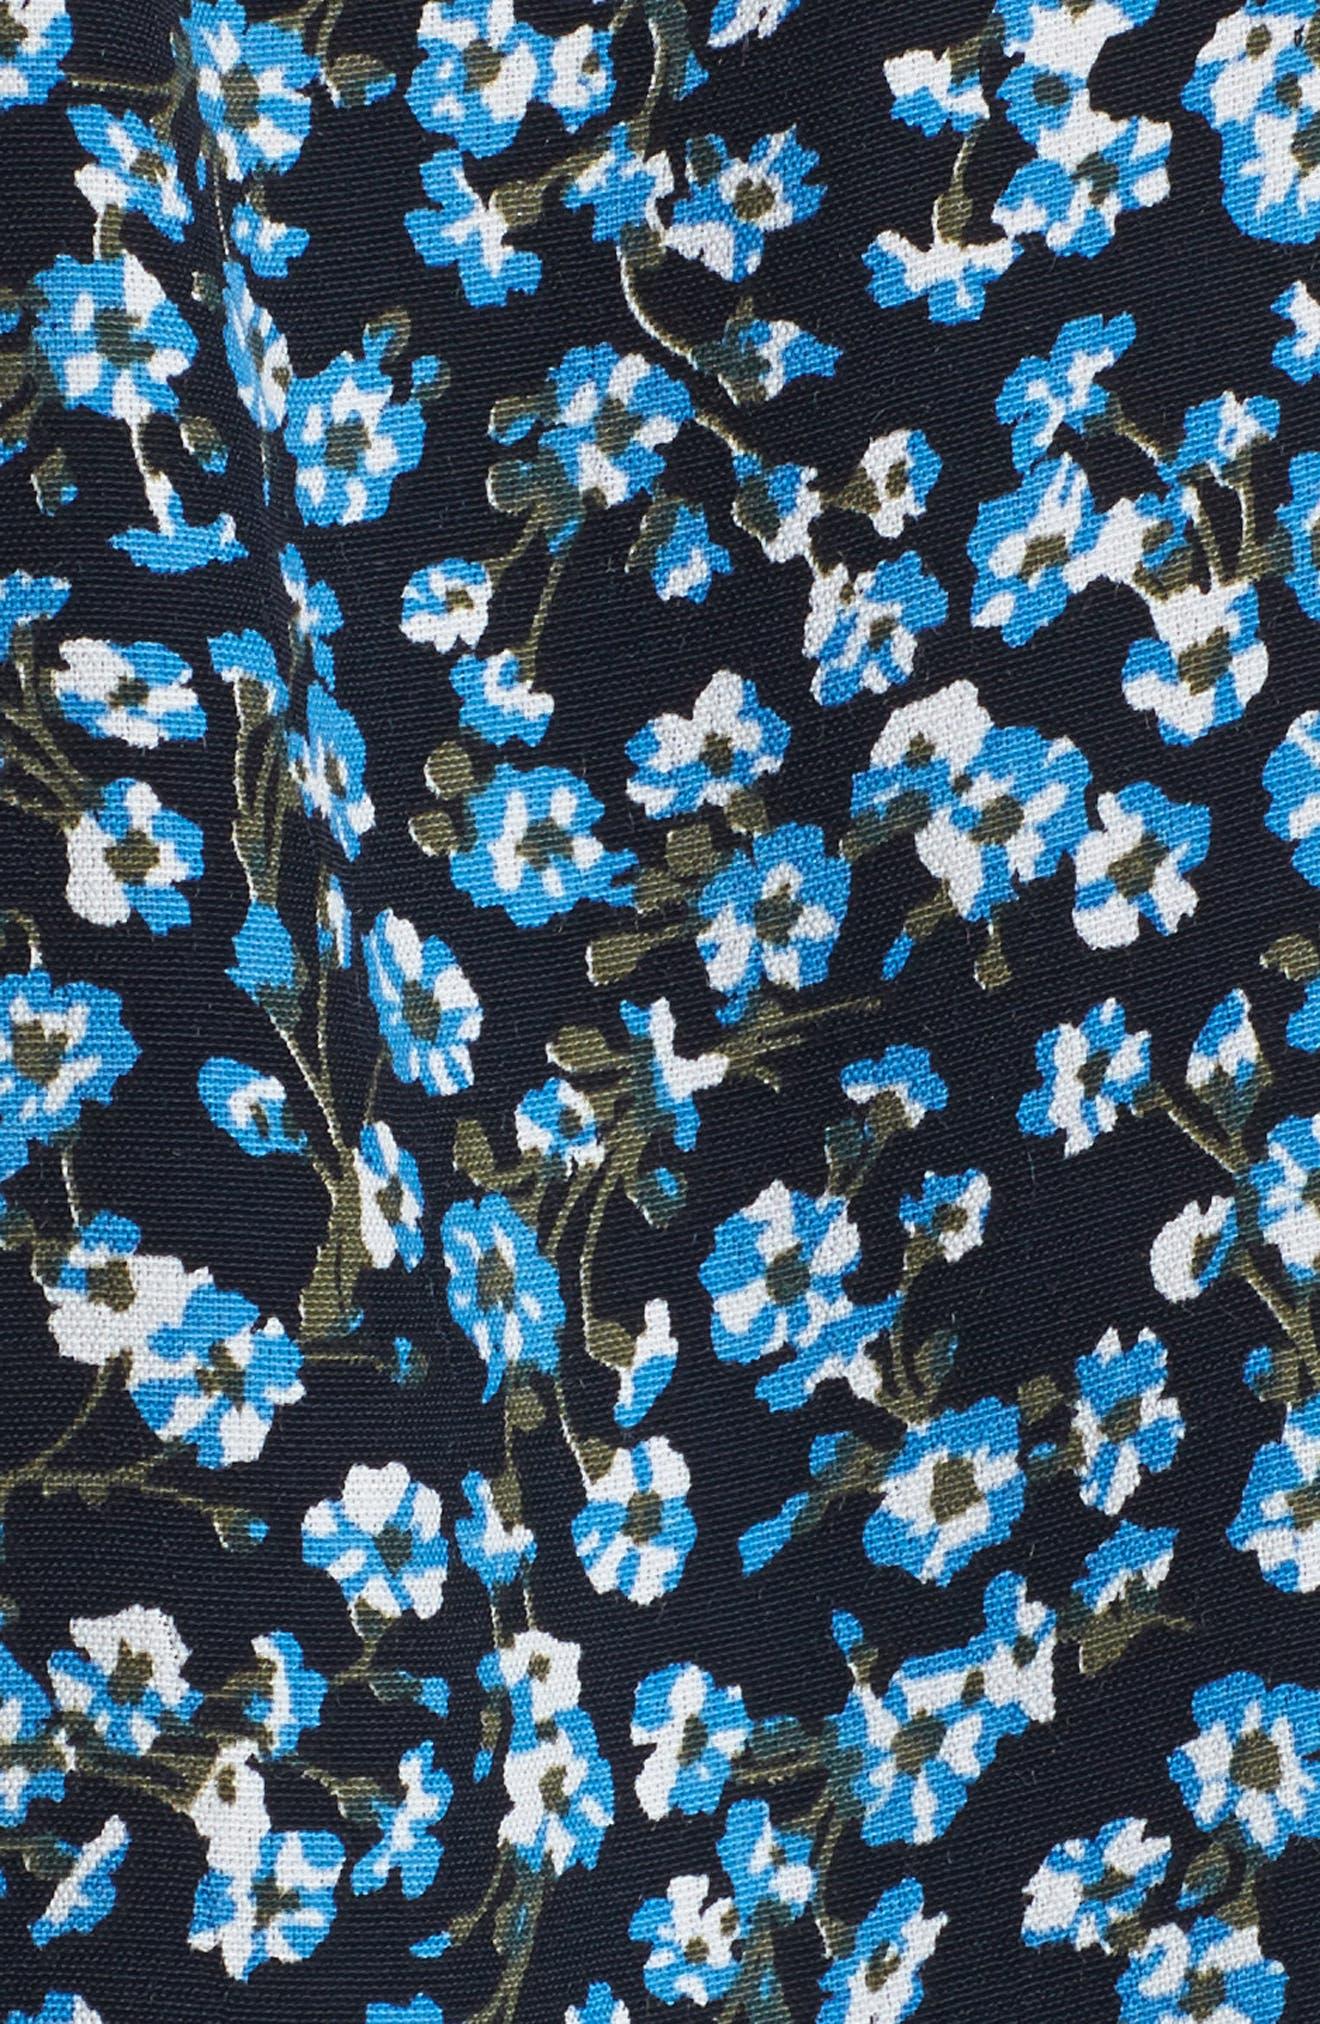 Oslo Floral Wrap Dress,                             Alternate thumbnail 5, color,                             Blossom Village Print - Blue